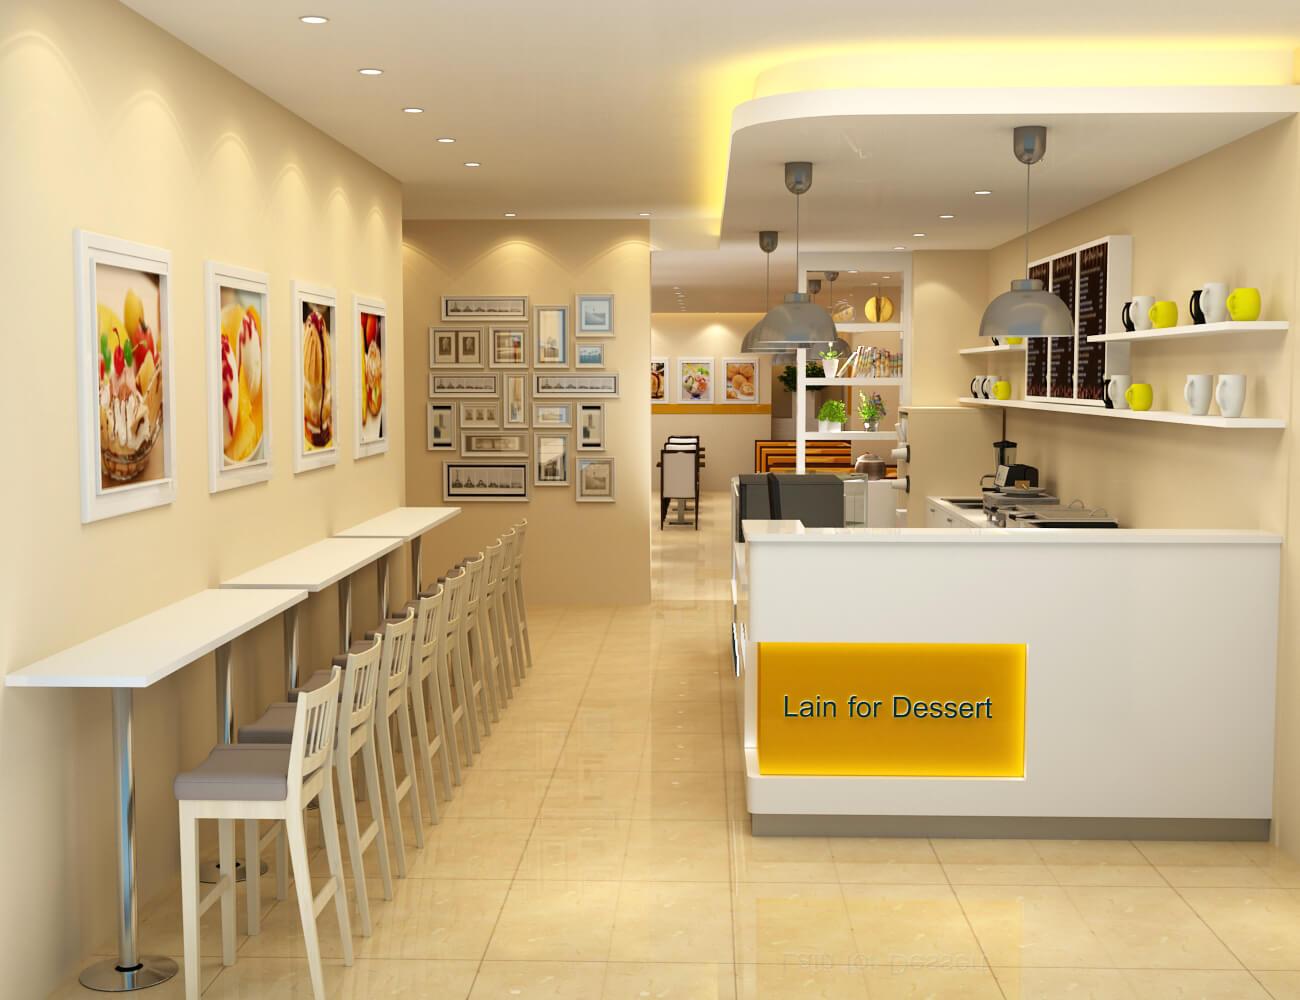 dessert shop furniture